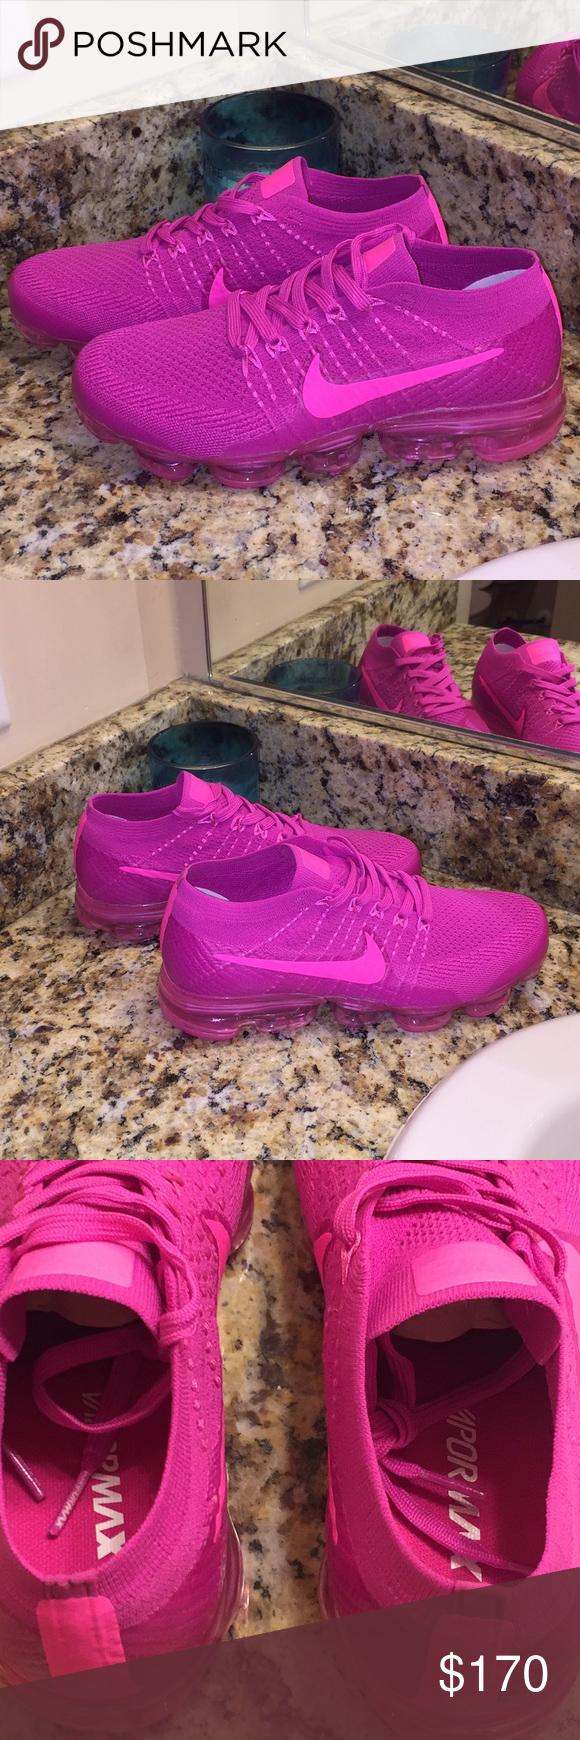 info for 094e5 ef48e Women's Vapormax vapor size 8 New Bright pink Nike Brand new ...